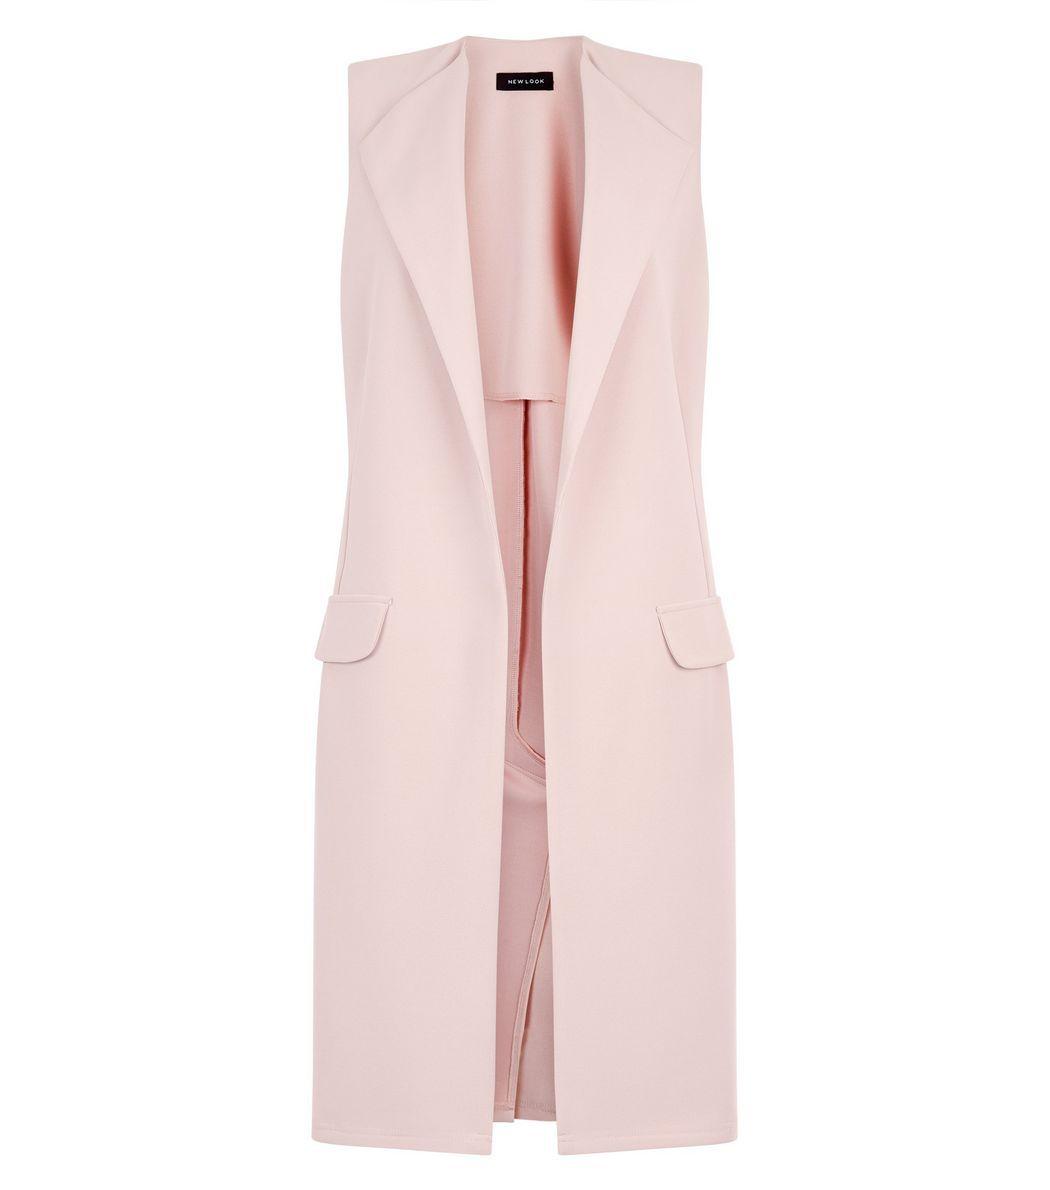 Shell Pink Double Pocket Sleeveless Jacket Sleeveless Jacket Outerwear Women Fashion